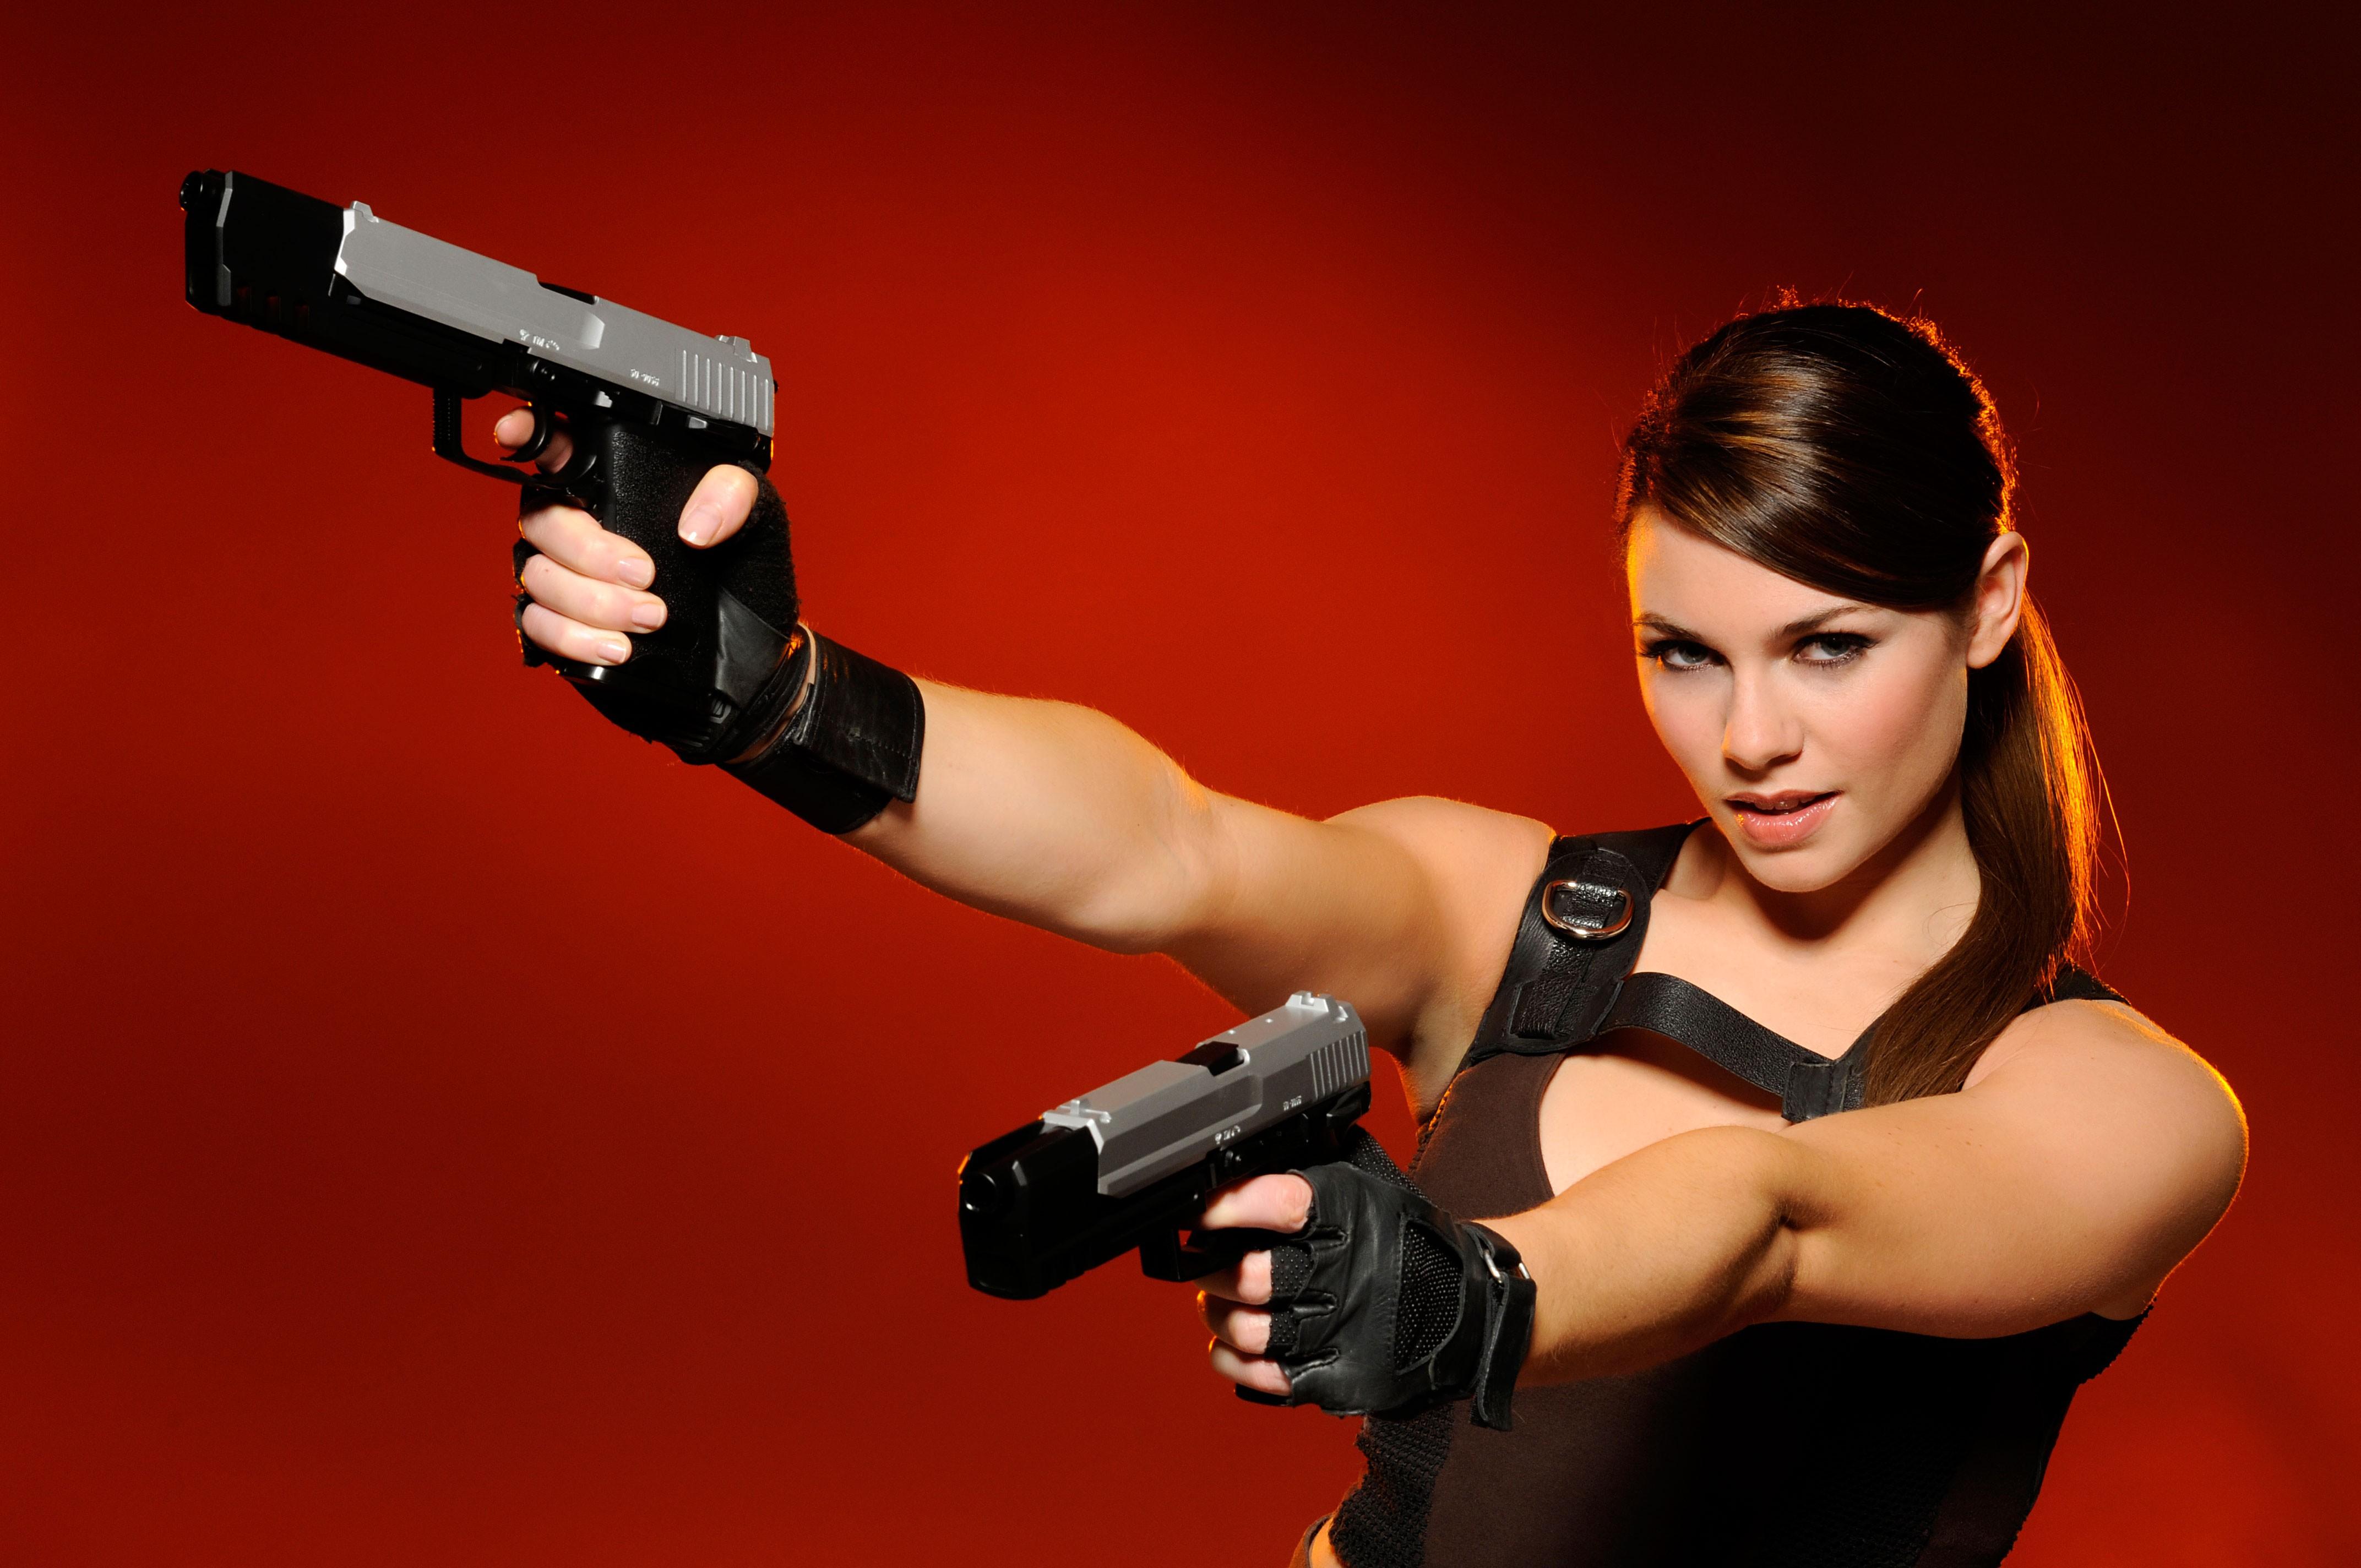 Обои На Телефон Девушки С Оружием